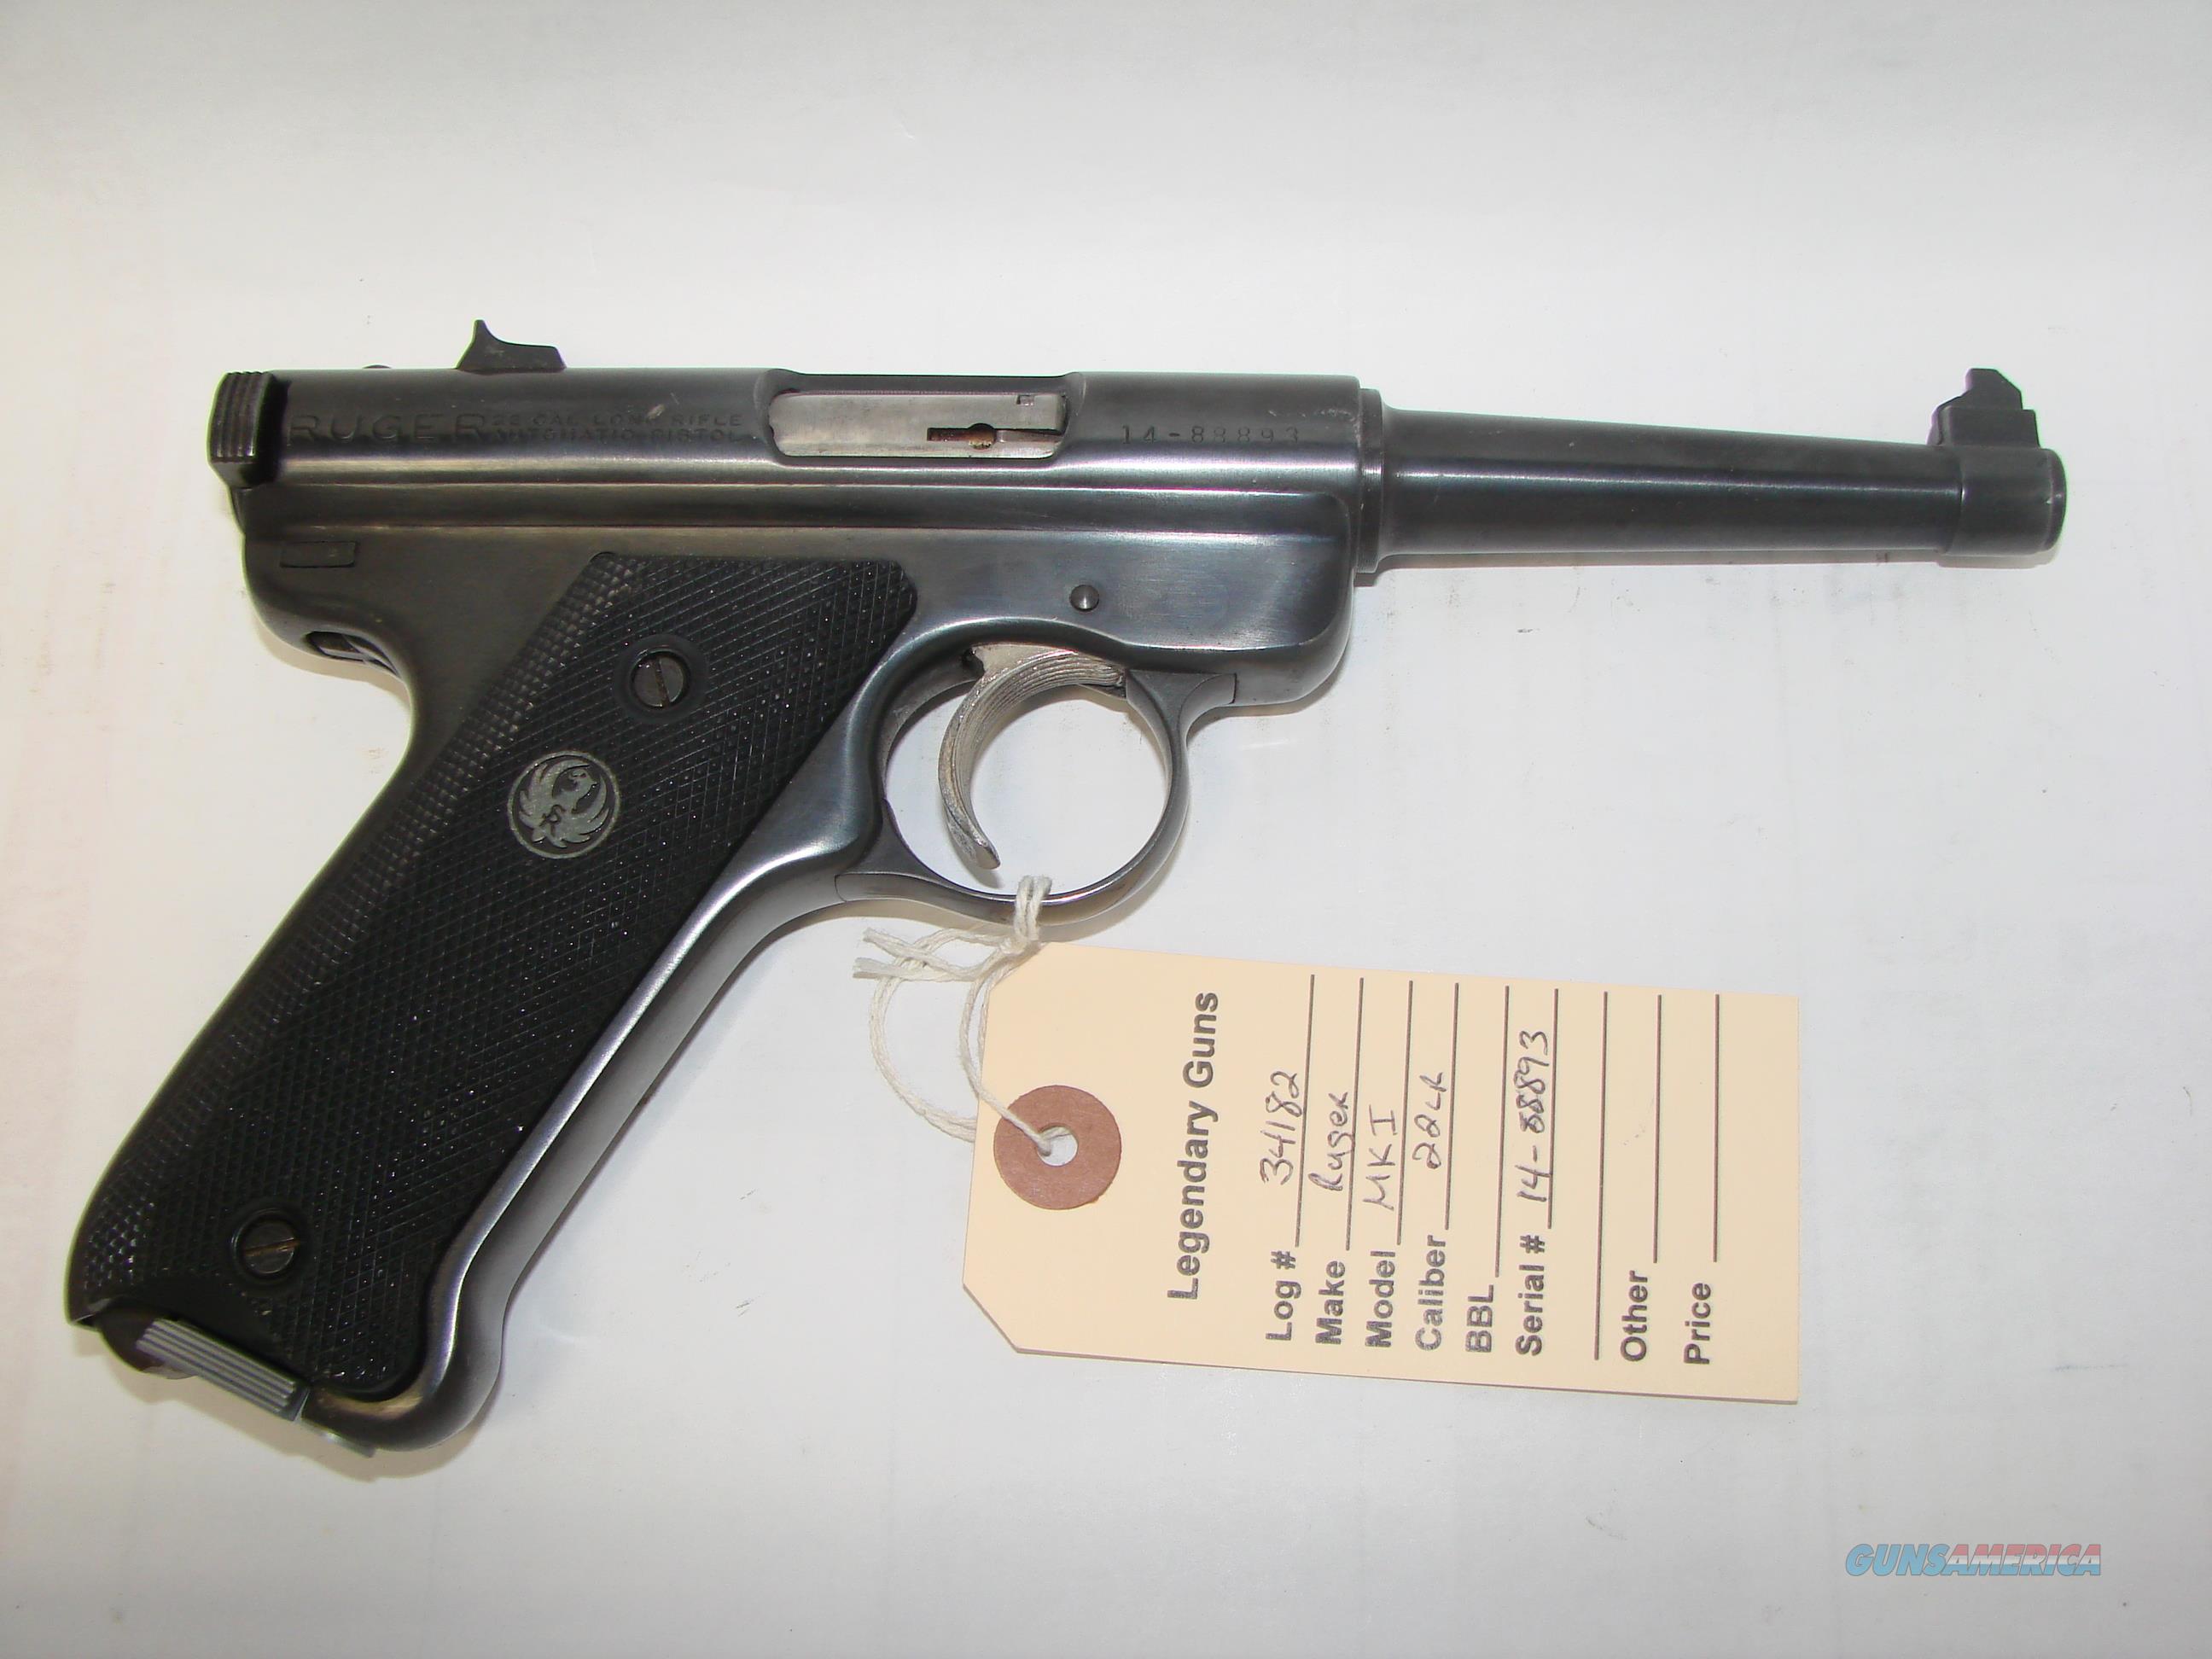 Ruger Mk I  Guns > Pistols > Ruger Semi-Auto Pistols > Mark I/II/III/IV Family